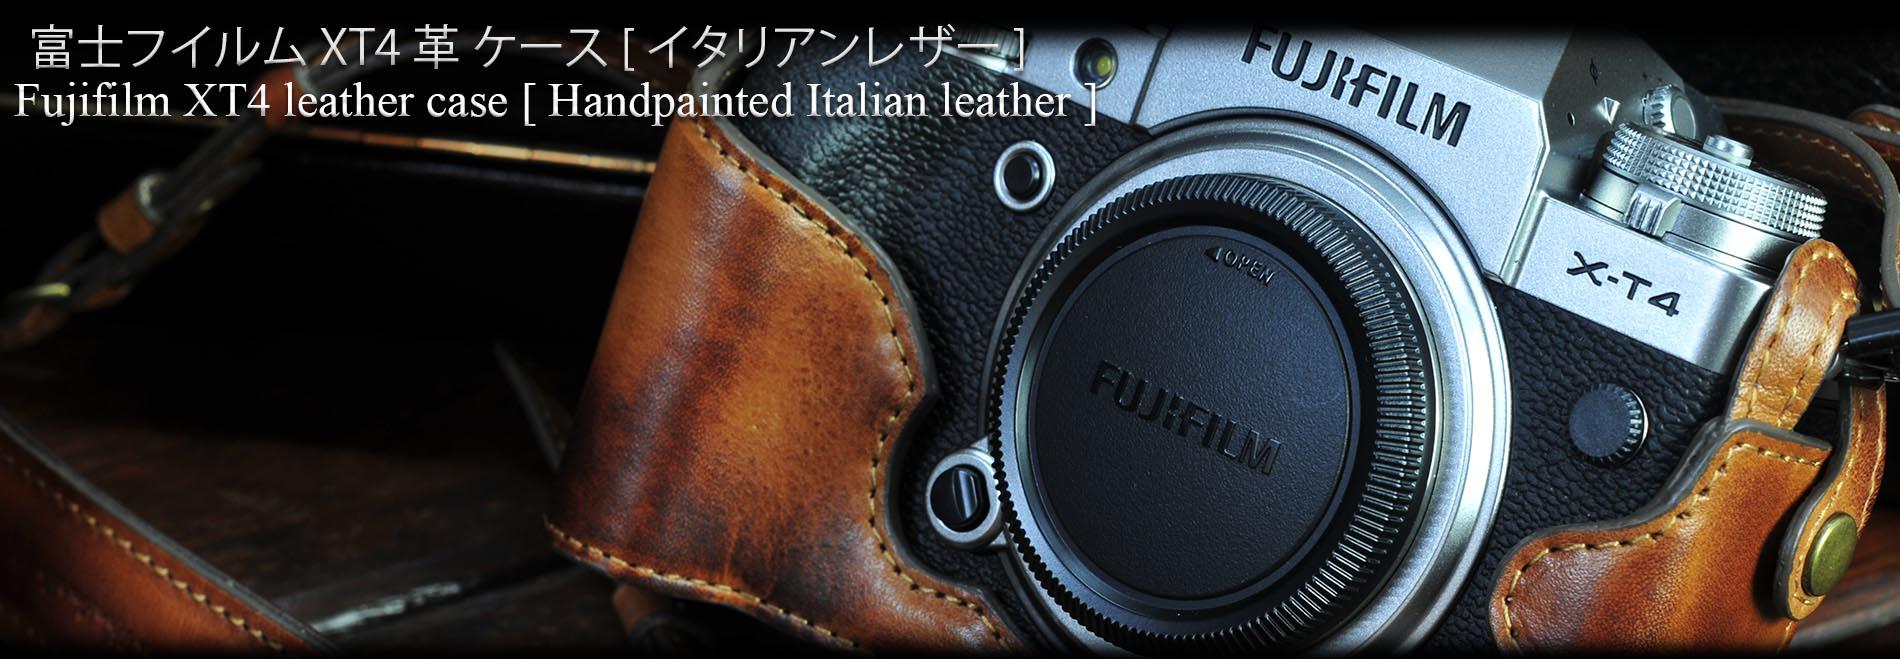 Fujifilm x-t4相機皮套, x-t4 leather case, fujifilm xt4カメラケース, フジフィルムxt4ボディケース, x-t4 half case,